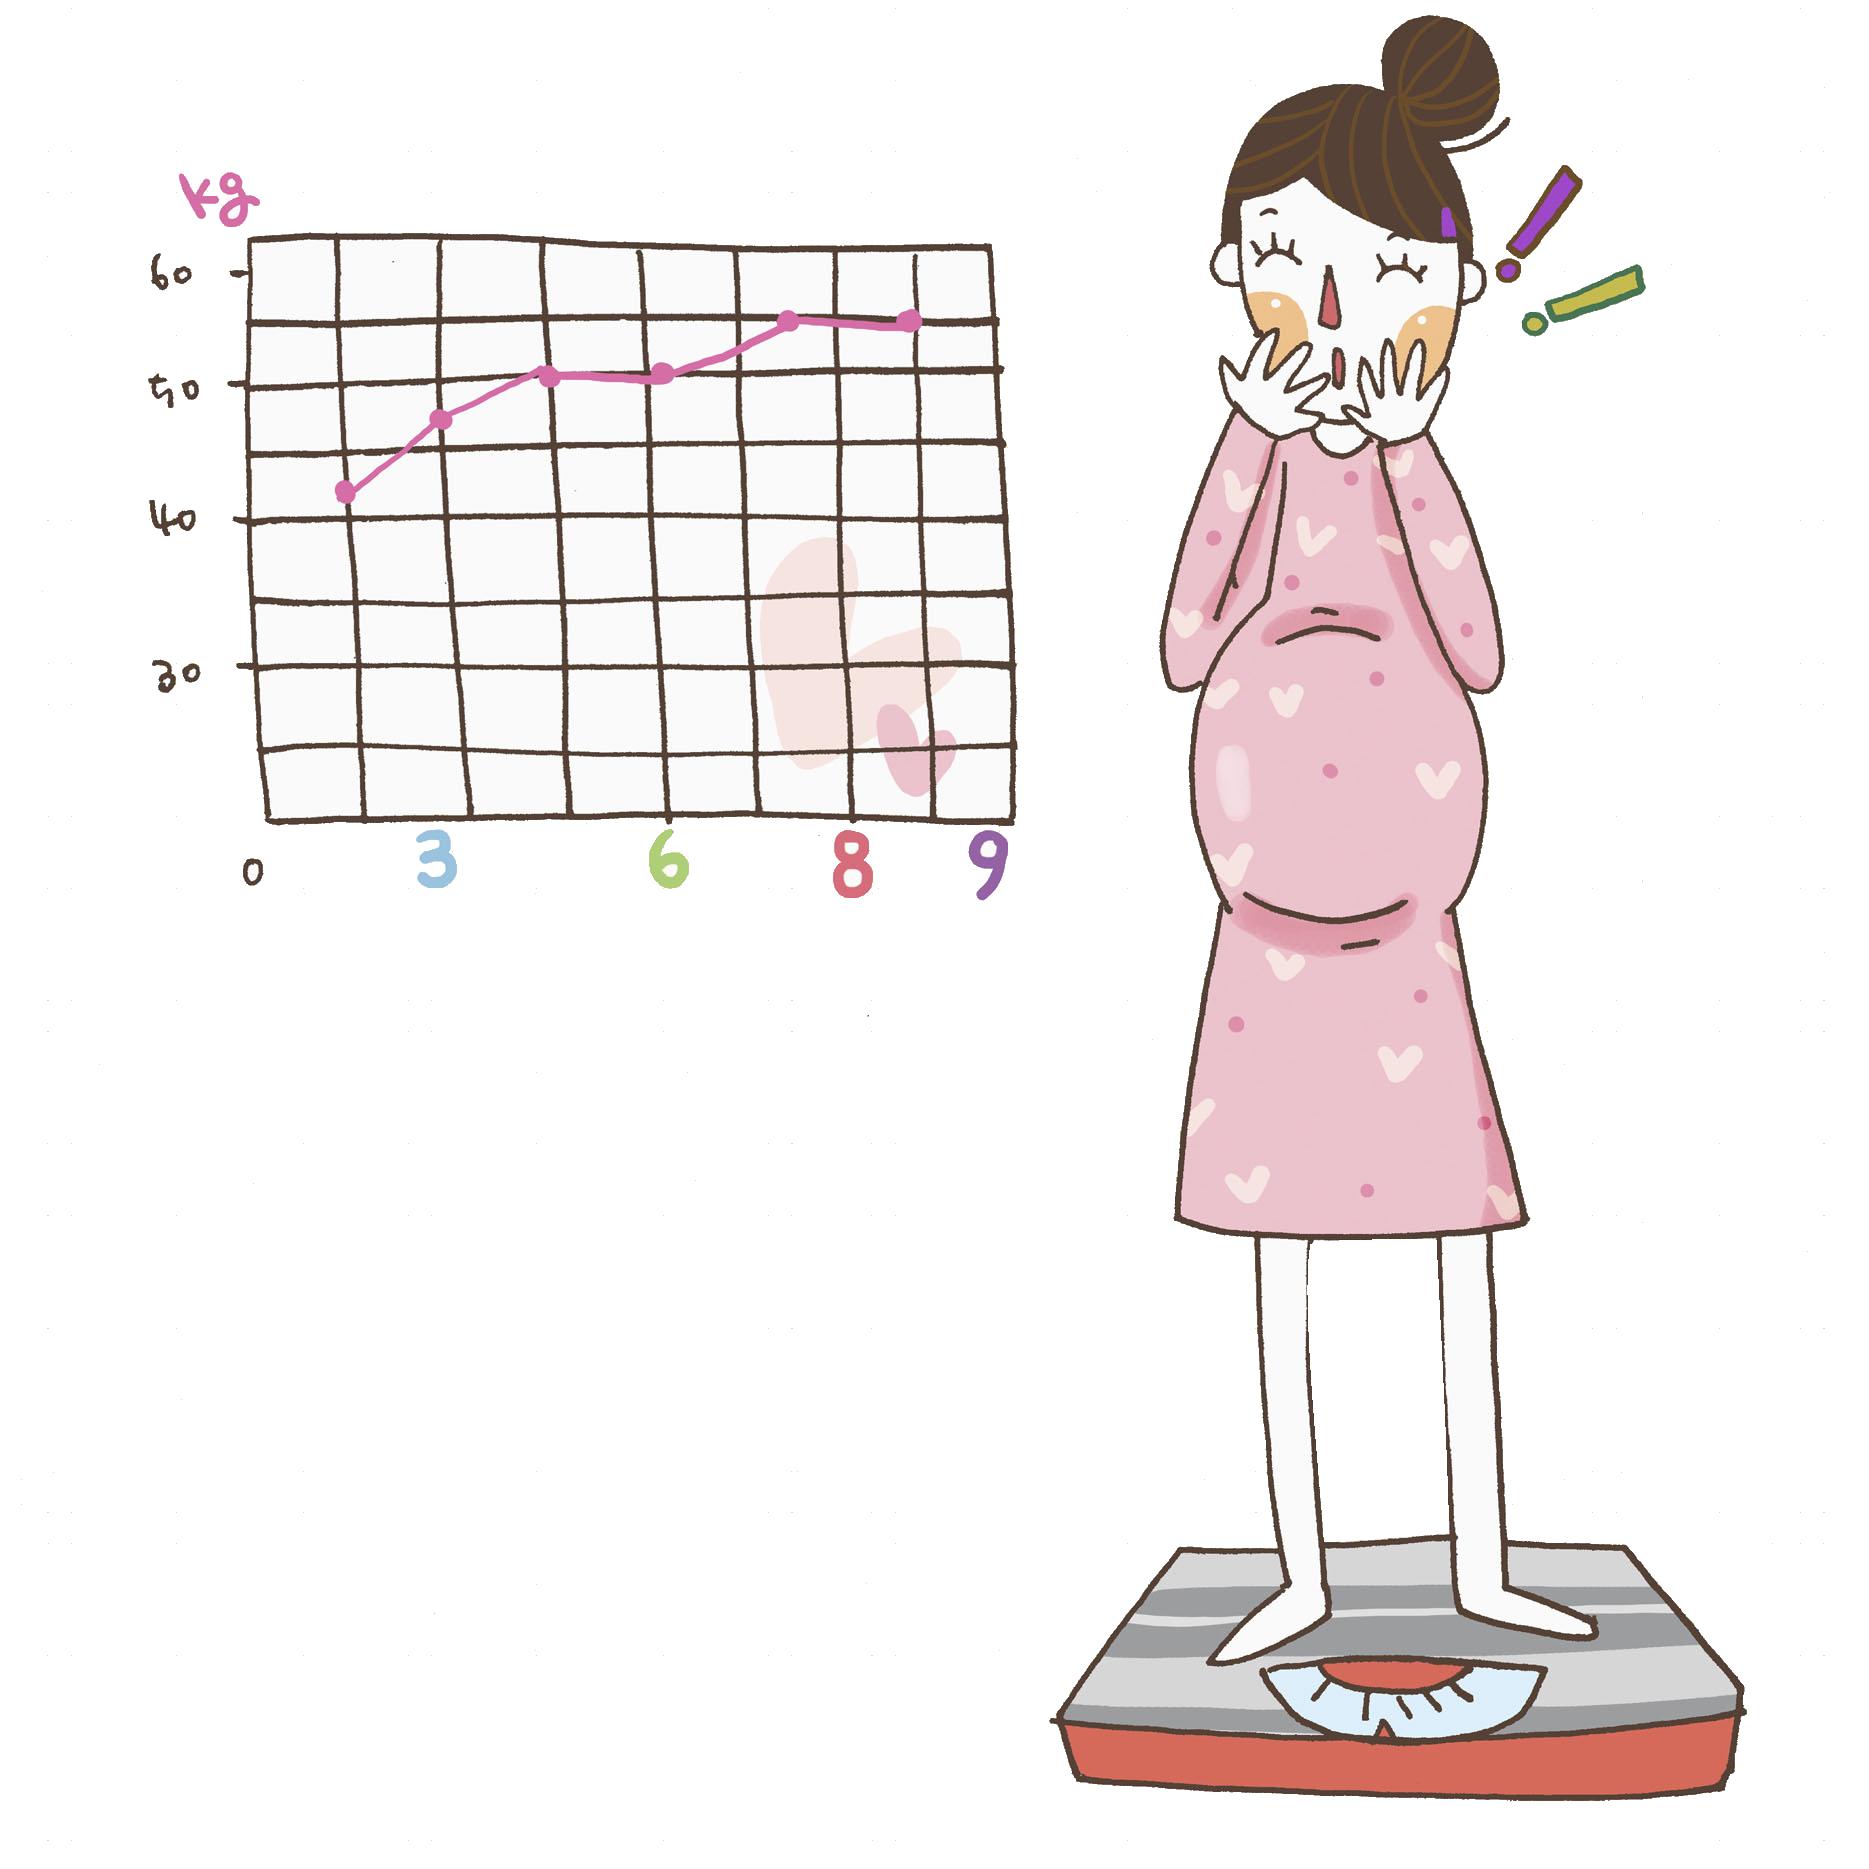 Pregnancy body weight u. Human clipart human figure